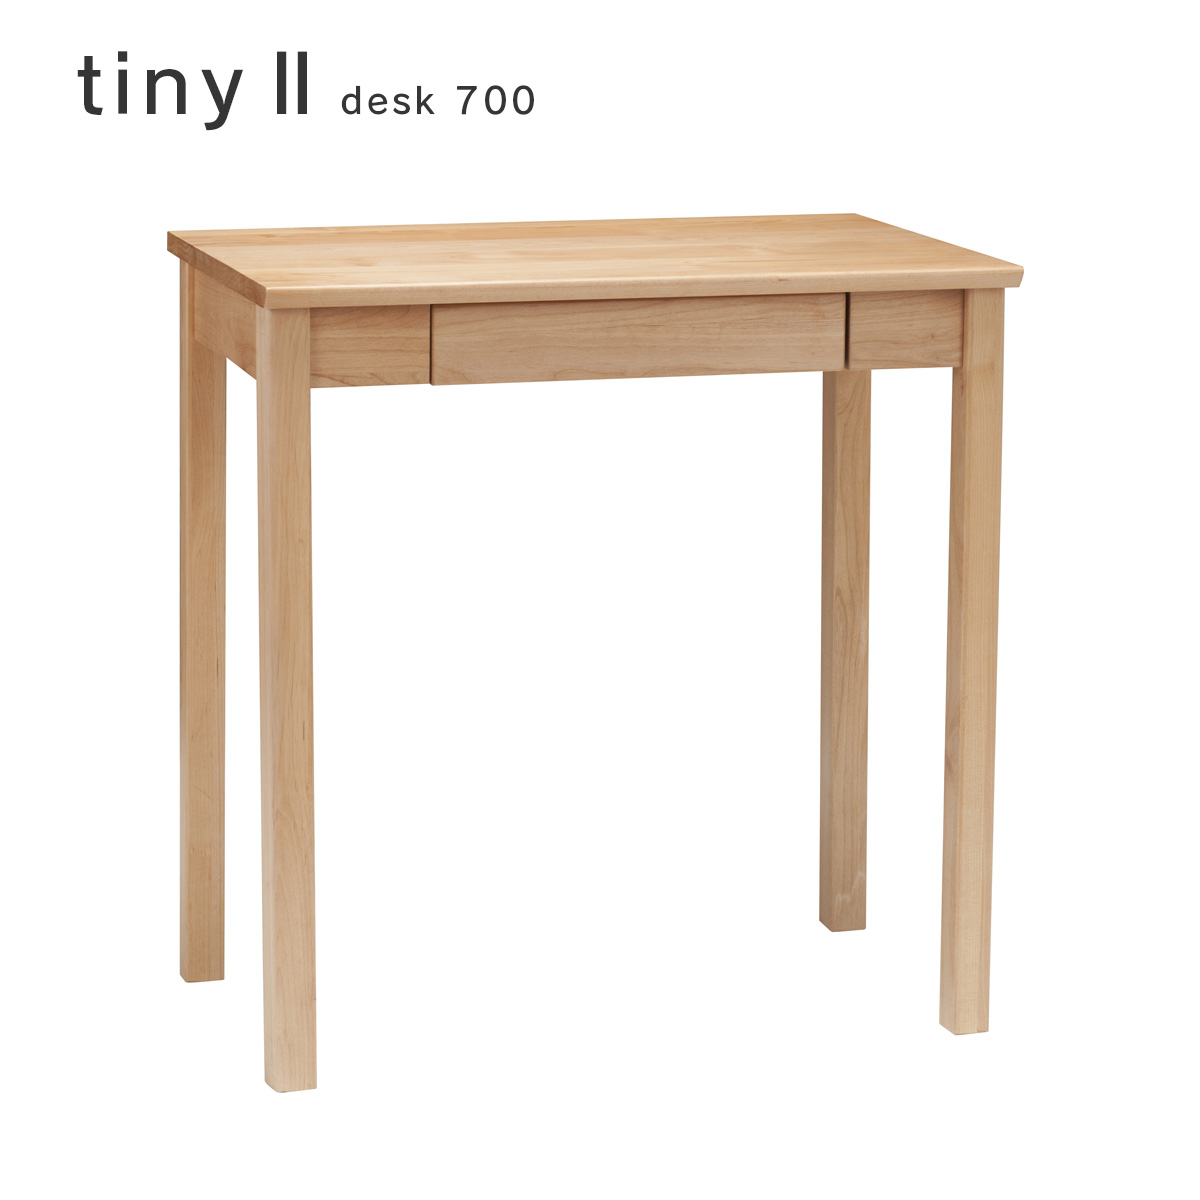 tiny2 デスク700 タイニー2 desk 机 幅70cm e-room